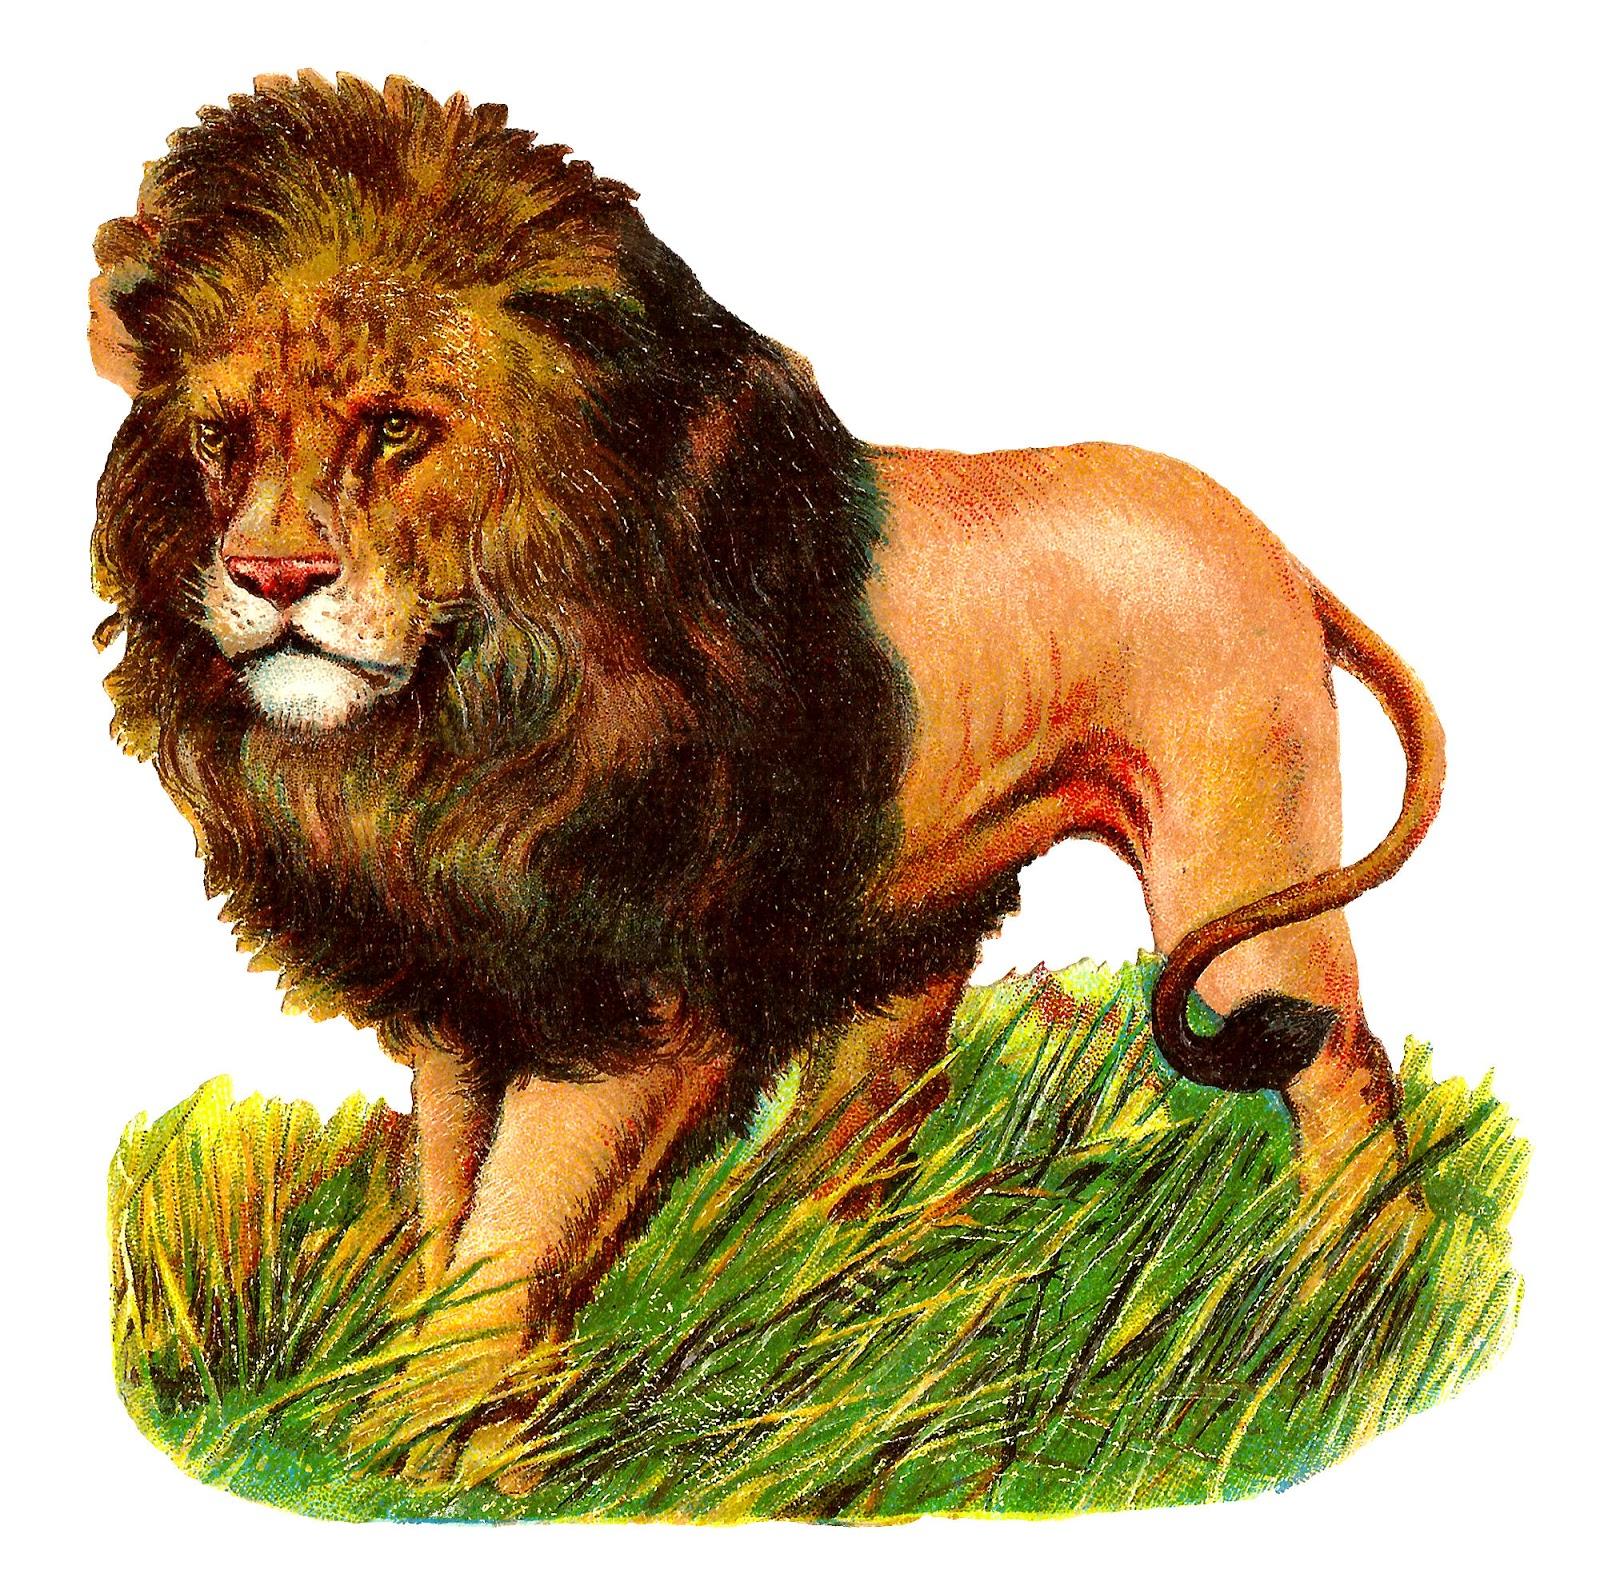 Antique Images: Wild Lion Stock Image Digital Animal ...